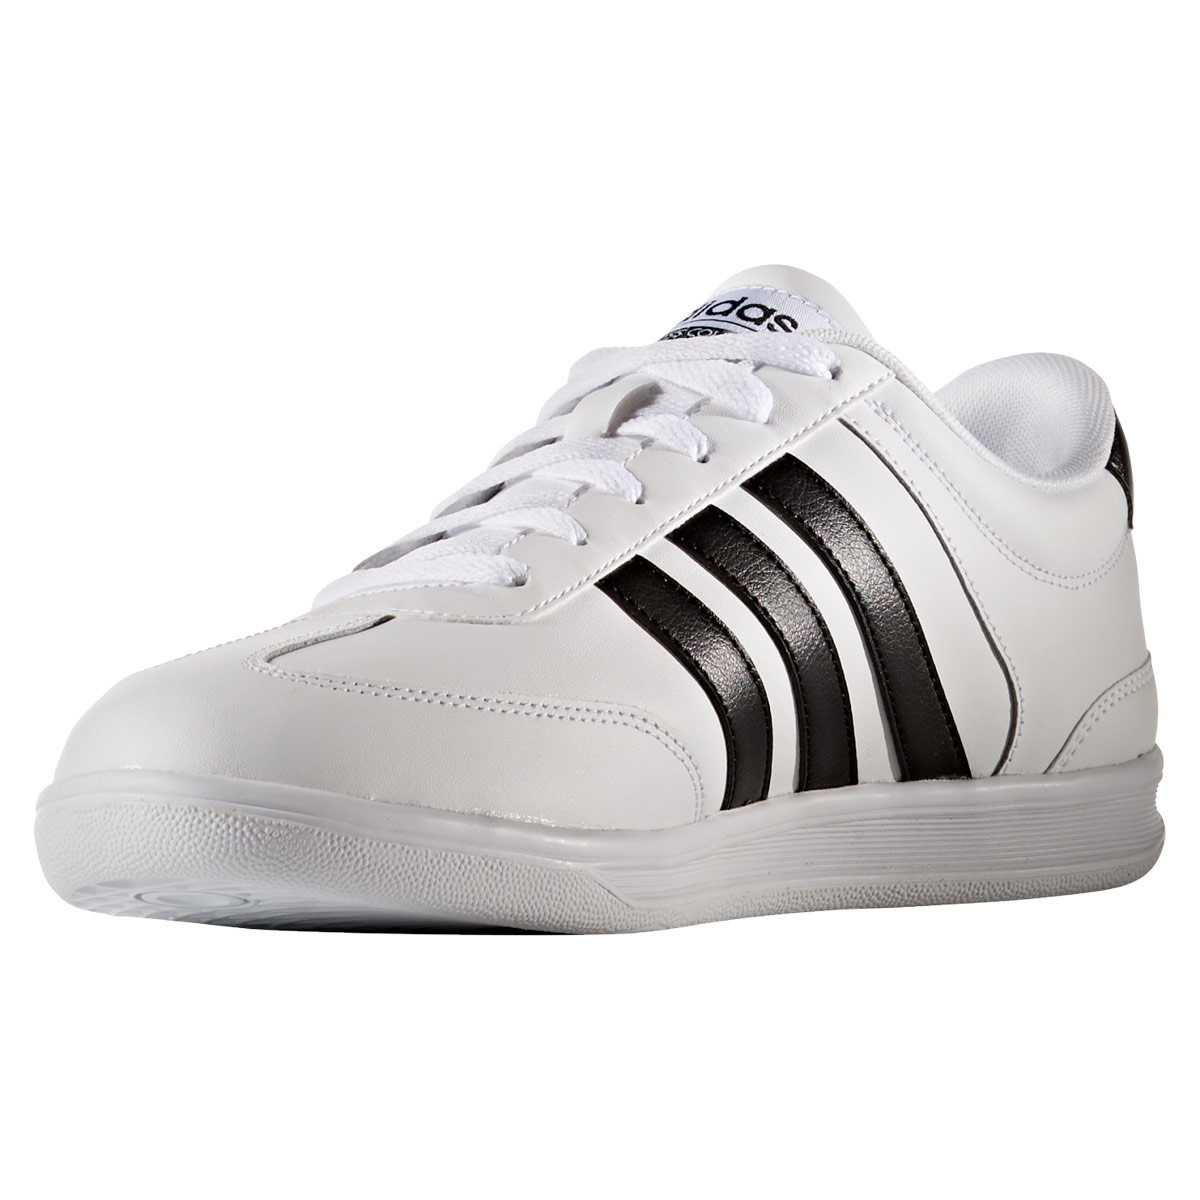 adidas neo croce corte scarpe da ginnastica per uomini bianchi 21run